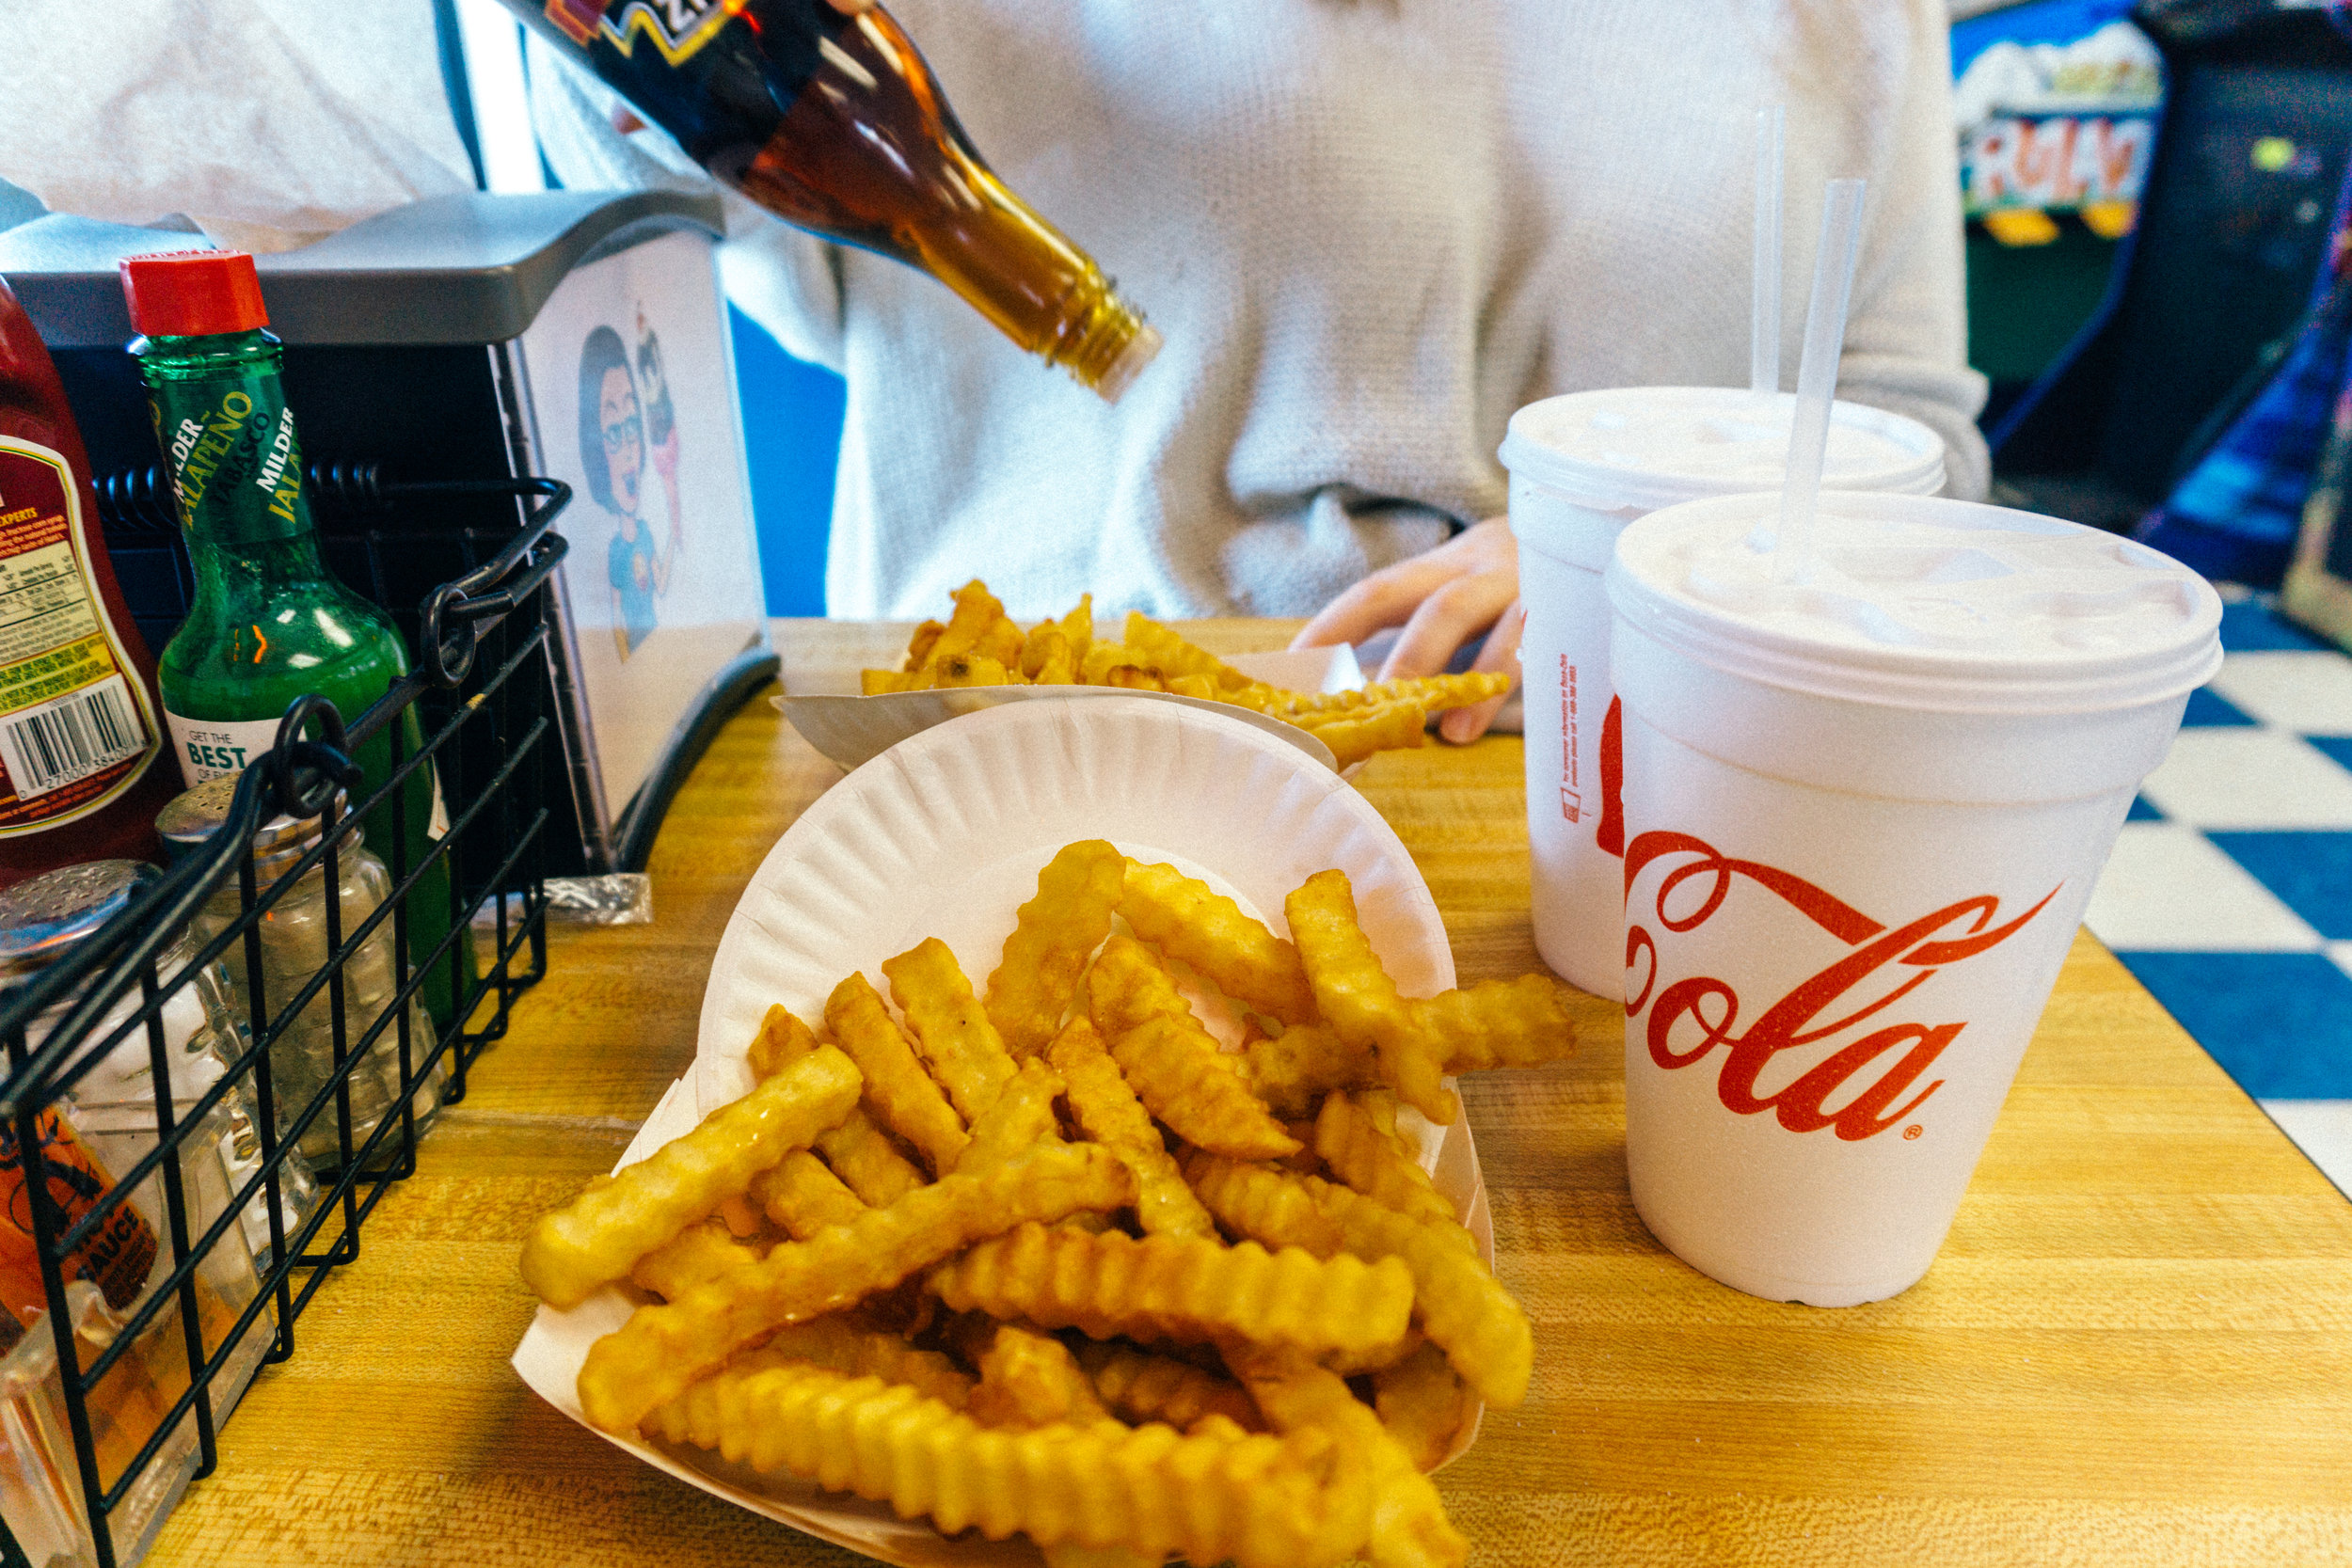 Ye Old Fashioned Fries with Malt Vinegar